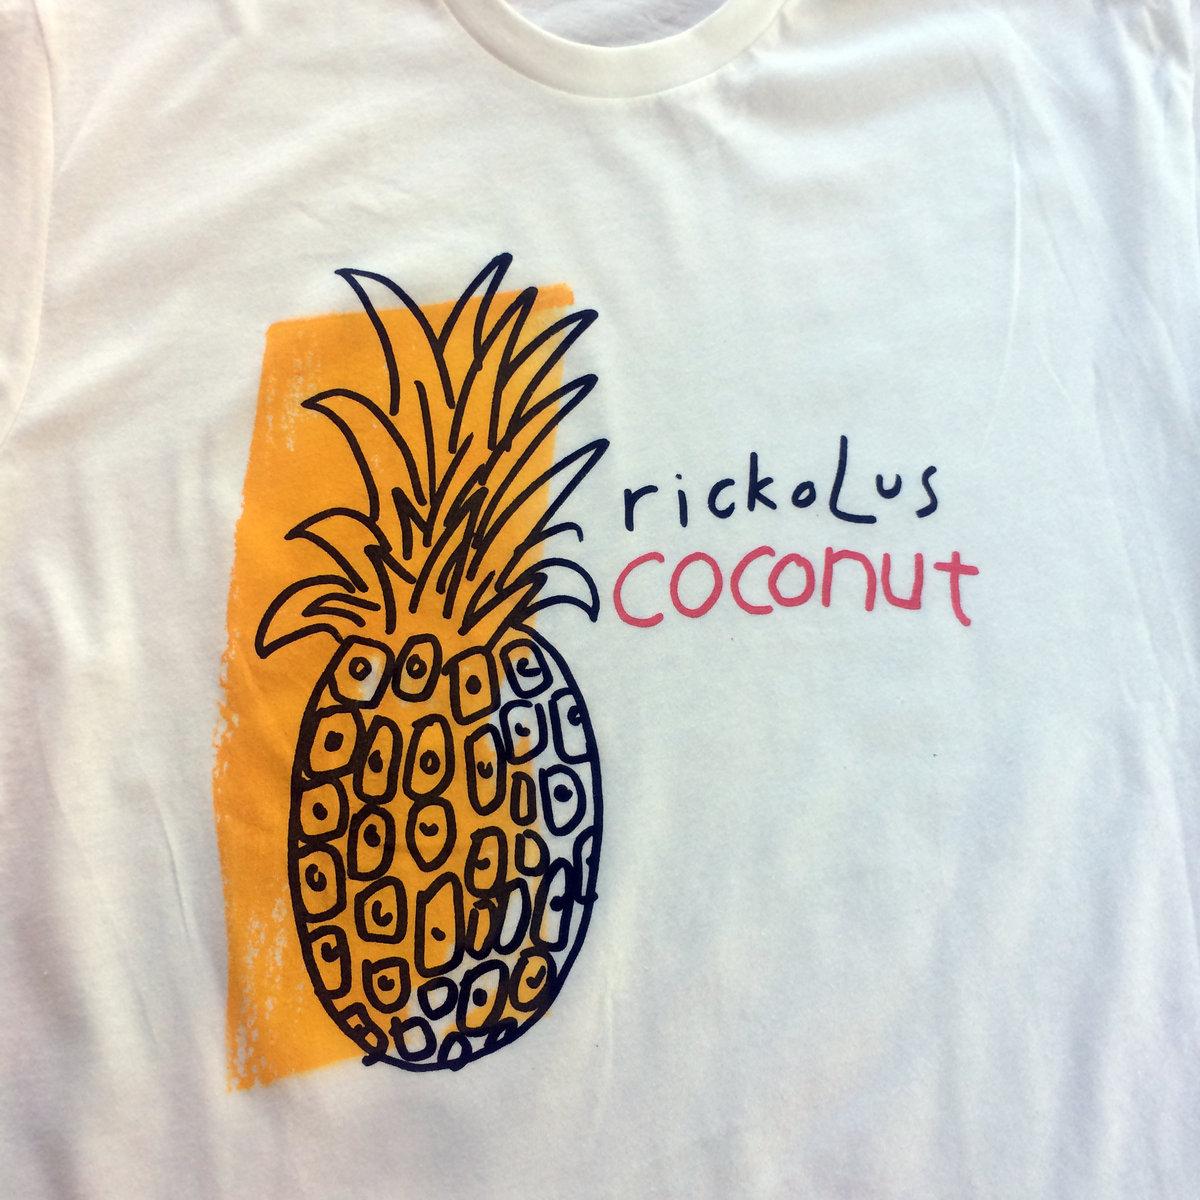 coconut rickolus